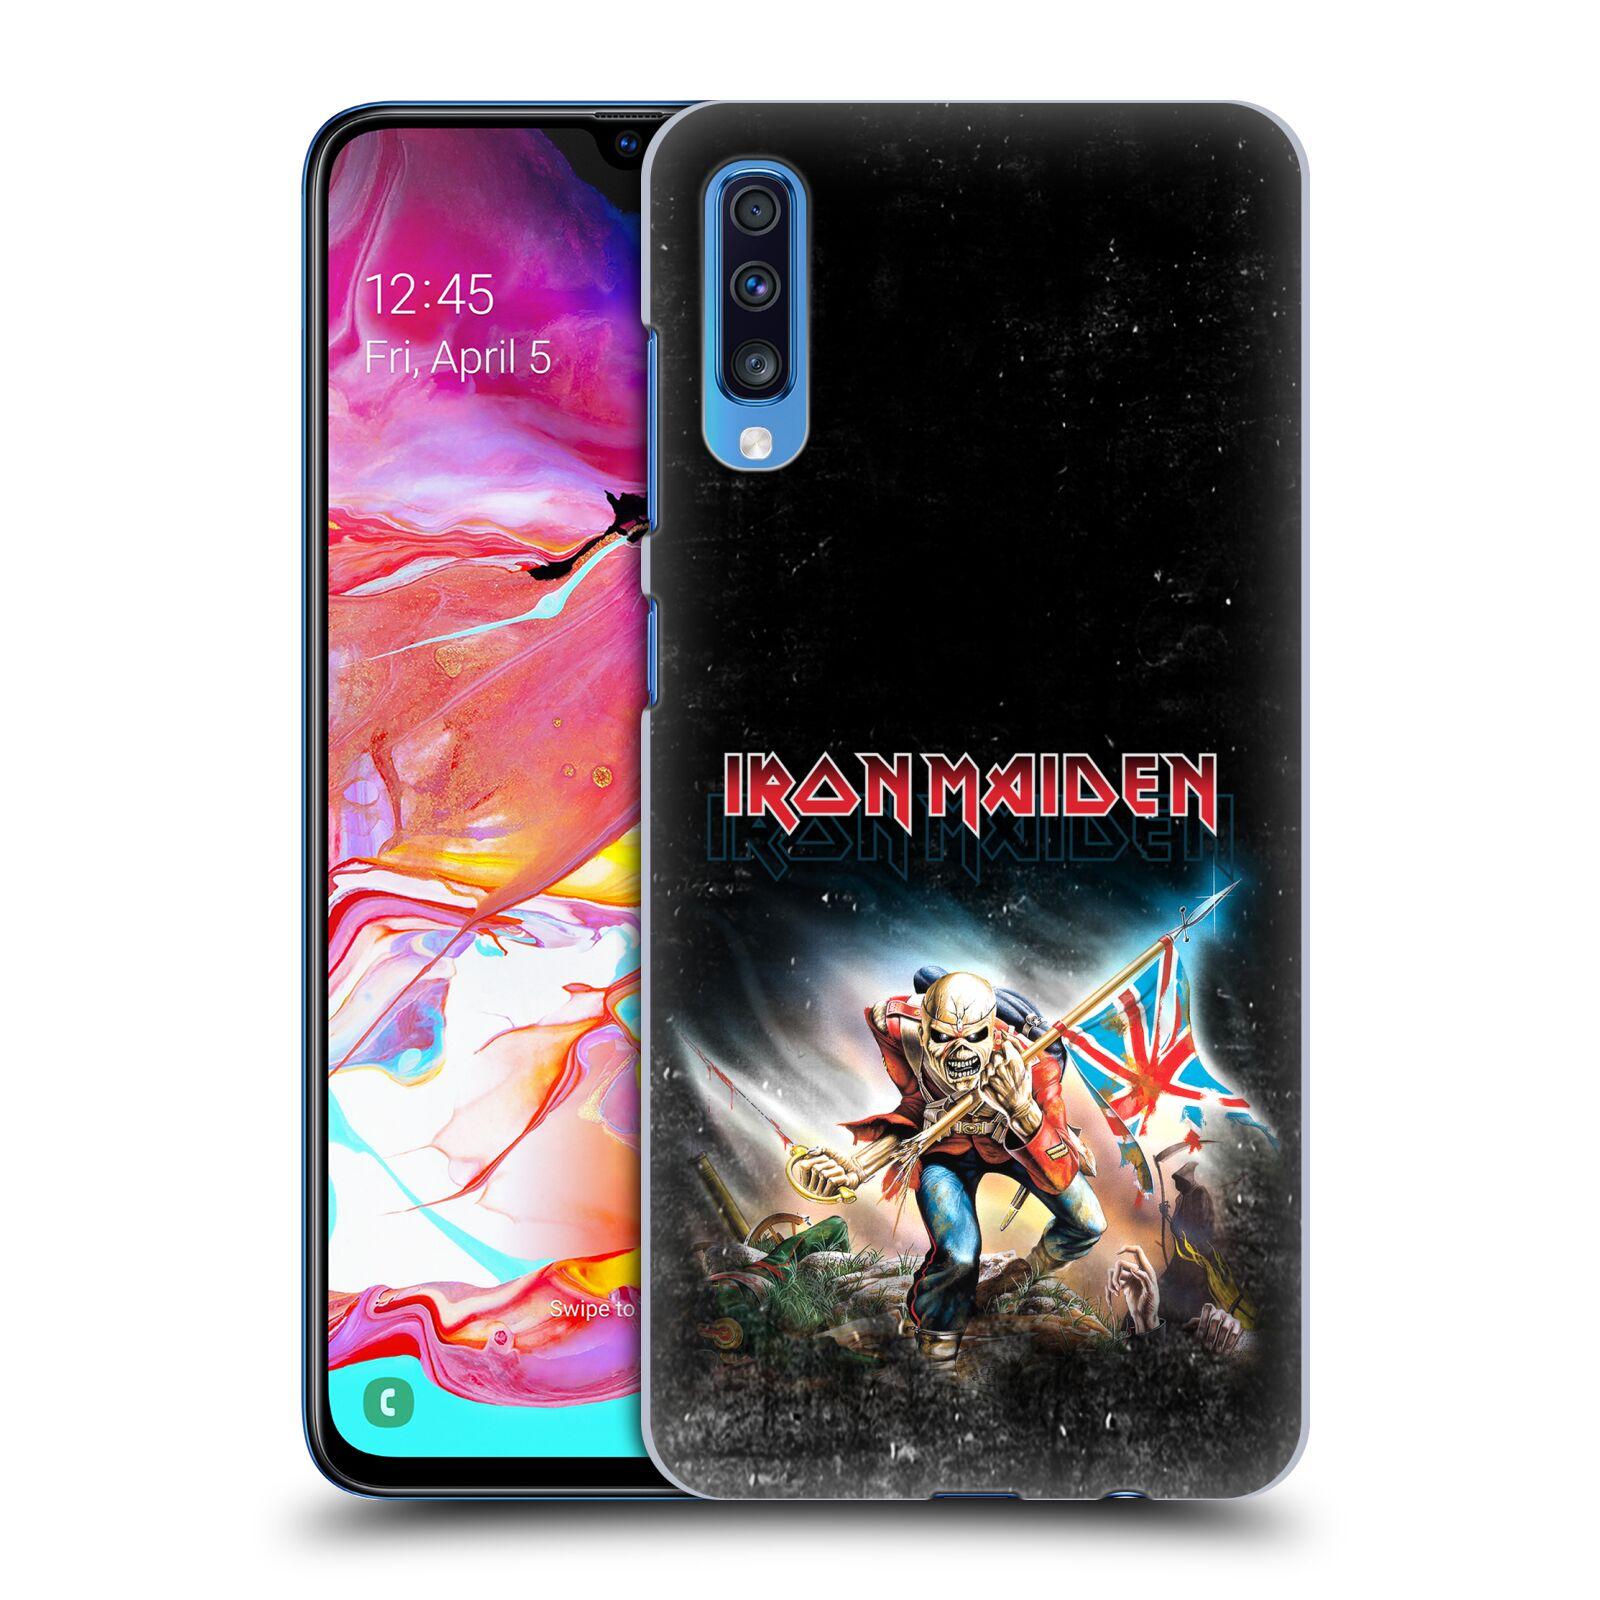 Plastové pouzdro na mobil Samsung Galaxy A70 - Head Case - Iron Maiden - Trooper 2016